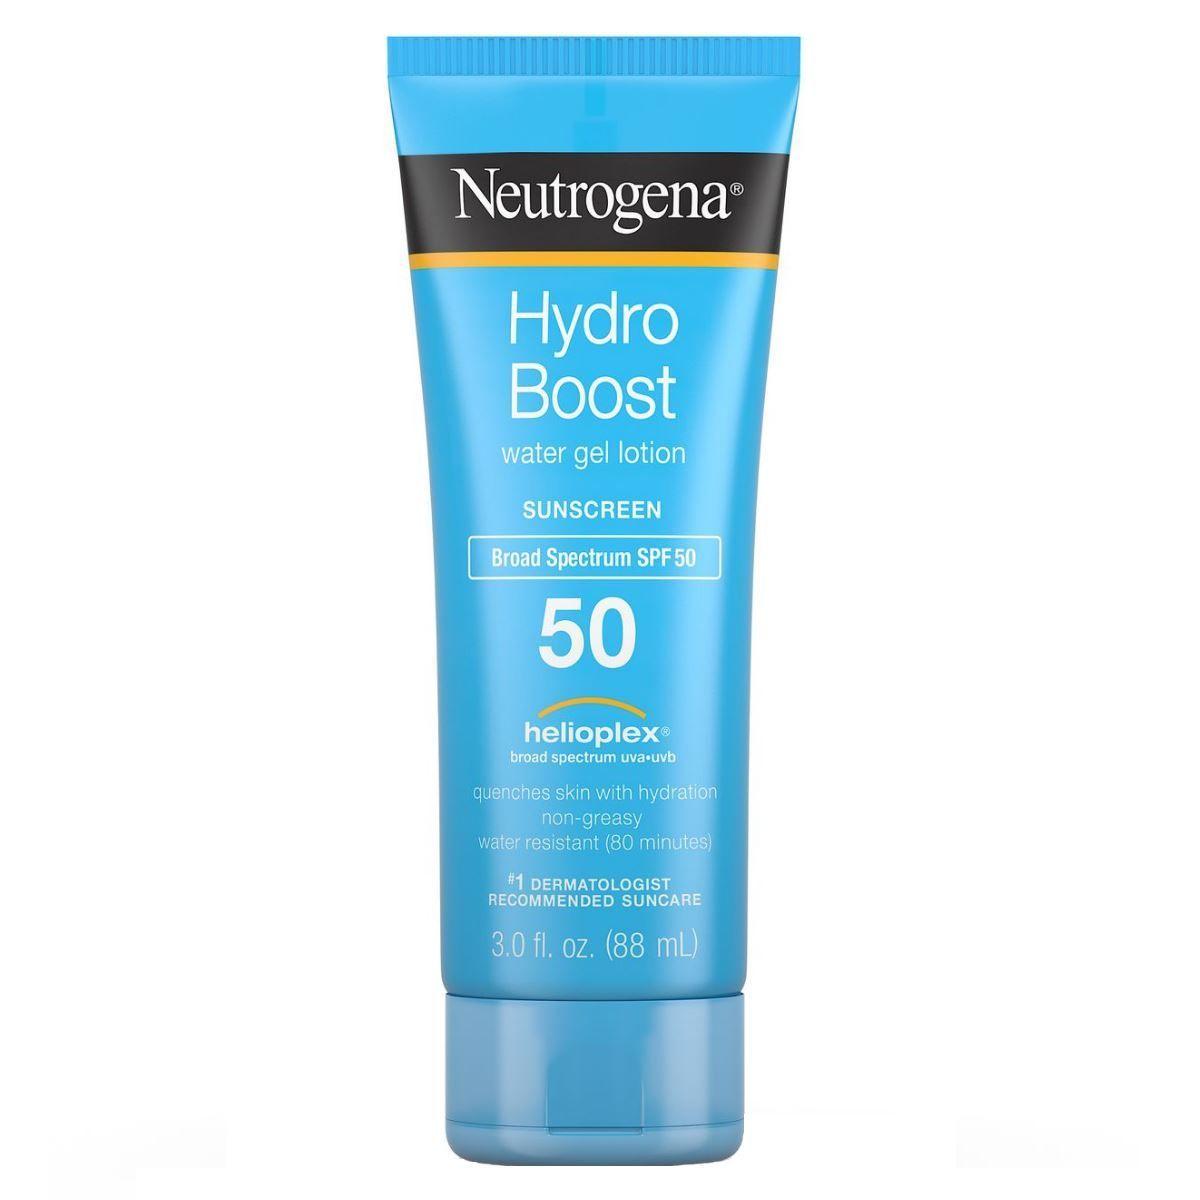 Hydro Boost Water Gel Lotion Sunscreen SPF 50